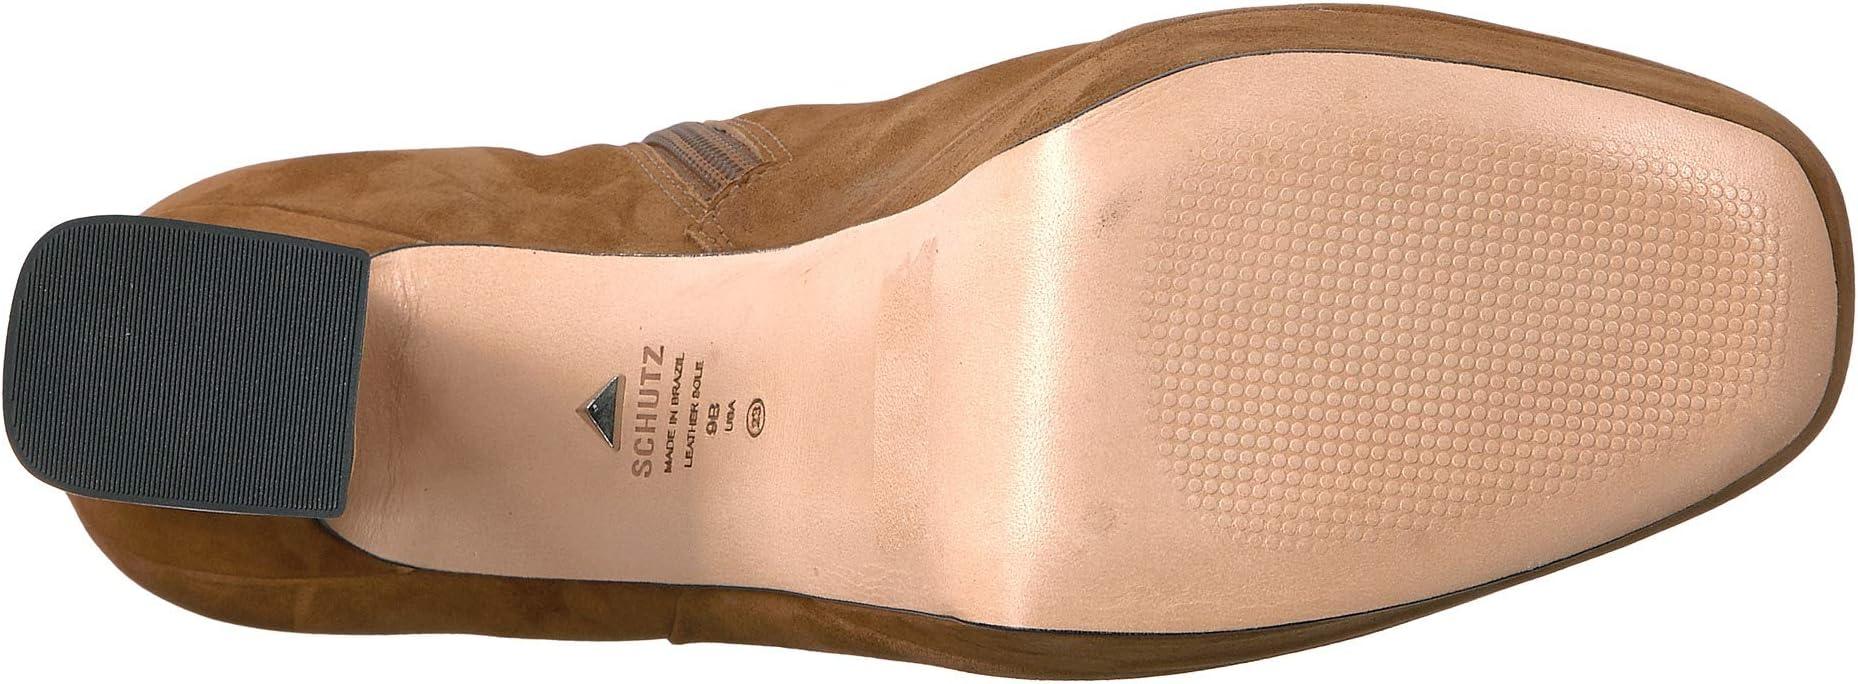 Schutz Sarina | Women's shoes | 2020 Newest